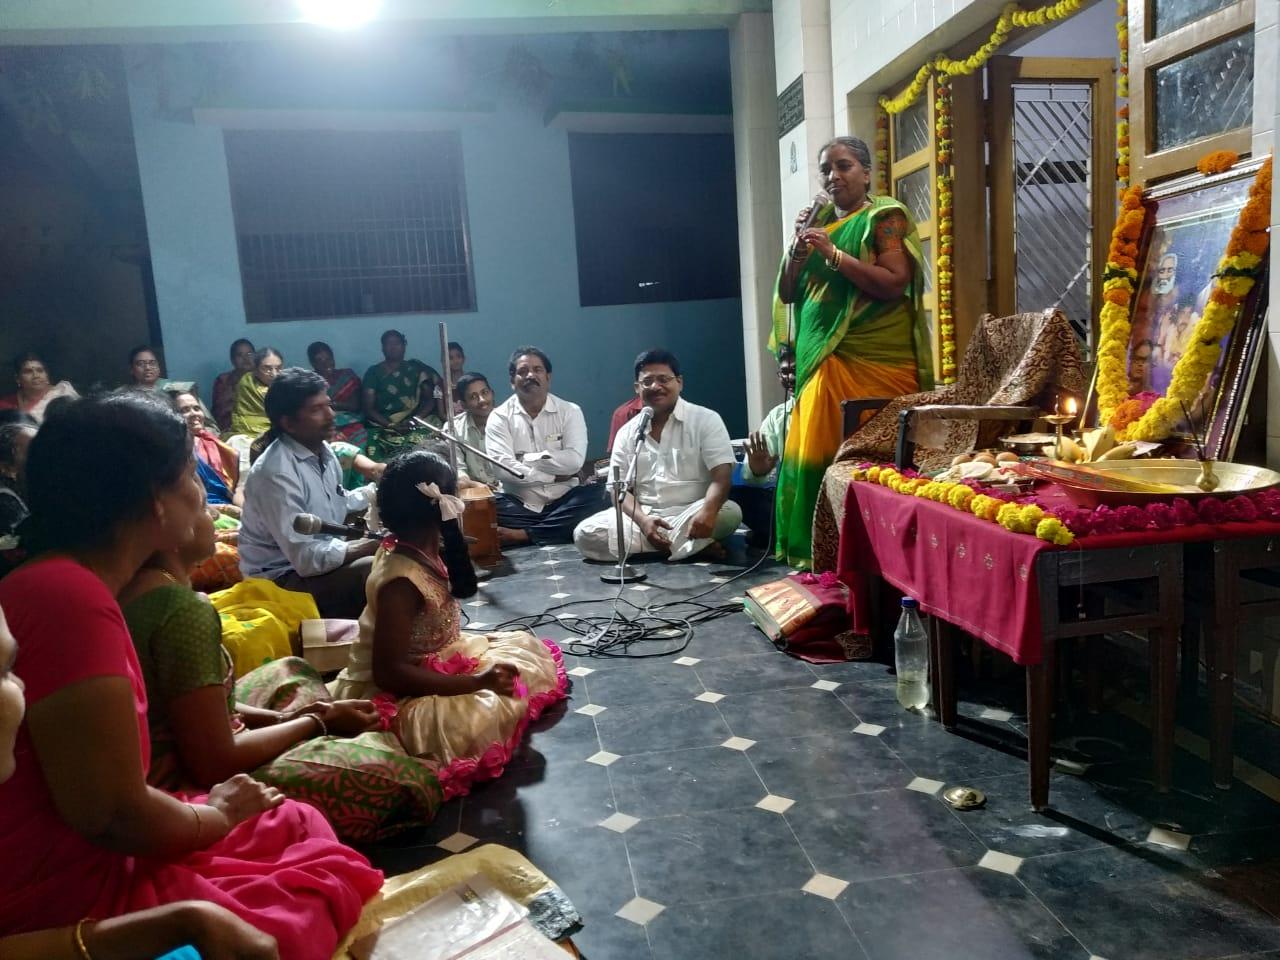 02-KarthikaMasam-Aaradhana-Aacchampeta-27112019